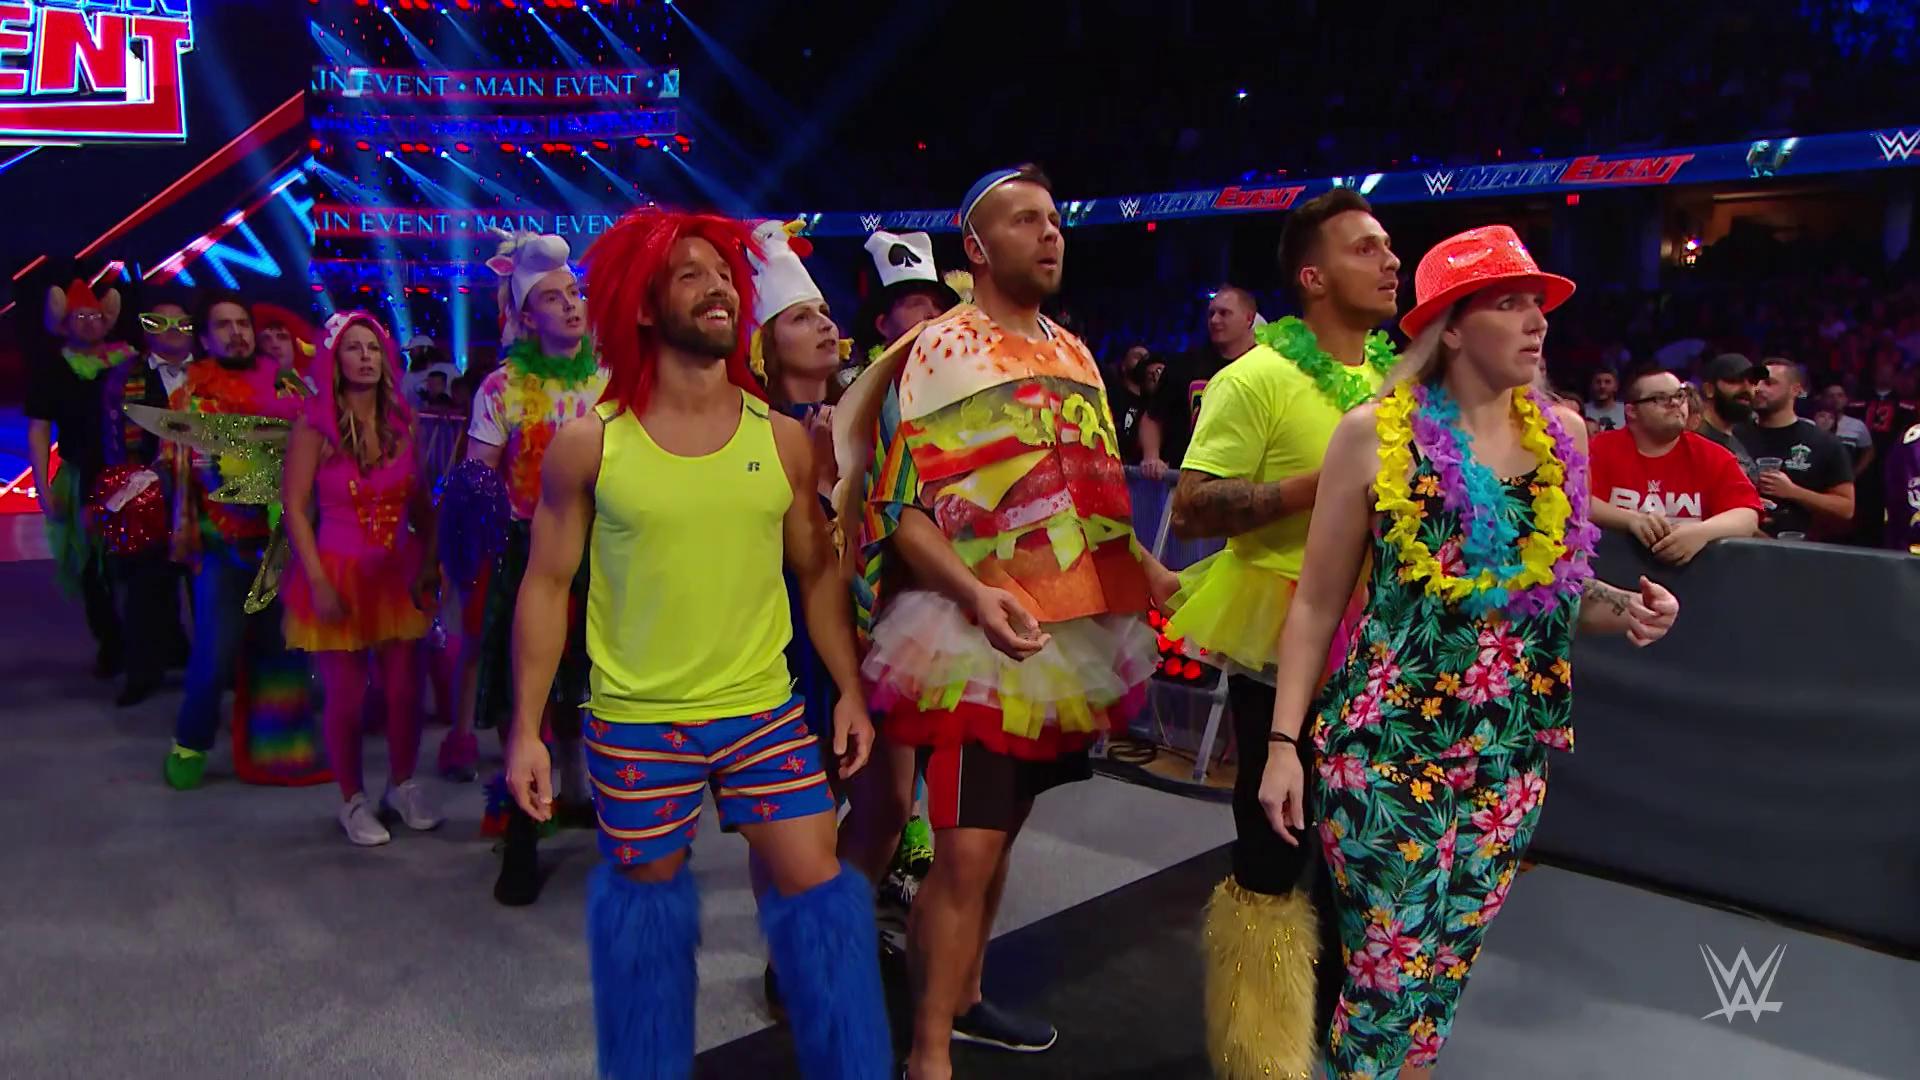 WWE Main Event 2019 10 24 1080p WEB x264-ADMIT